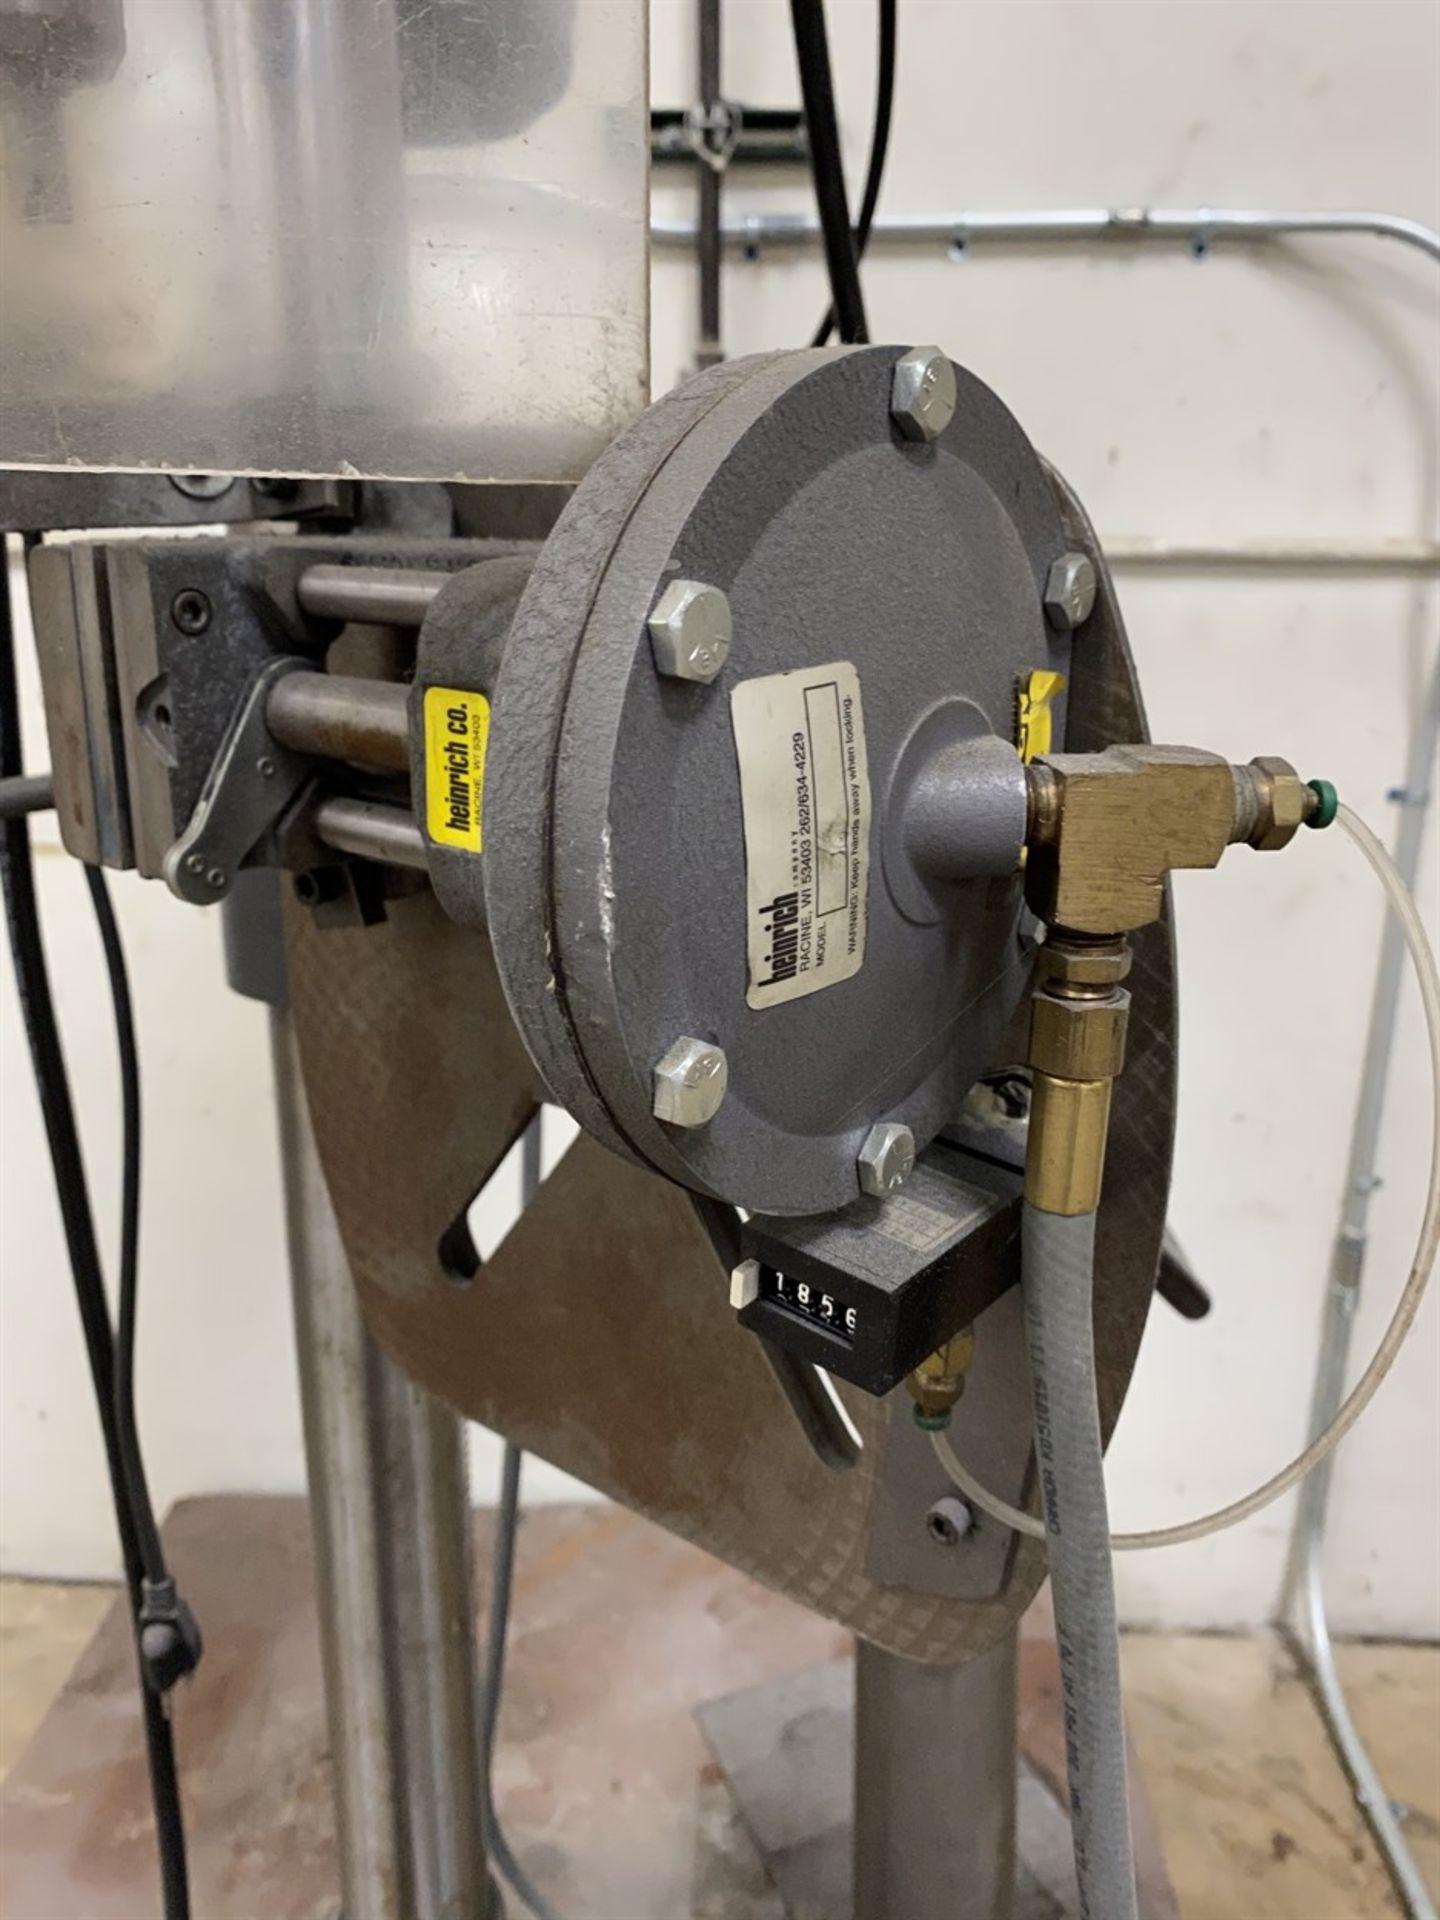 Lot 16 - RIDGID DP15501 Drill Press, s/n AM052443797, w/ Heinrich Pneumatic Vise